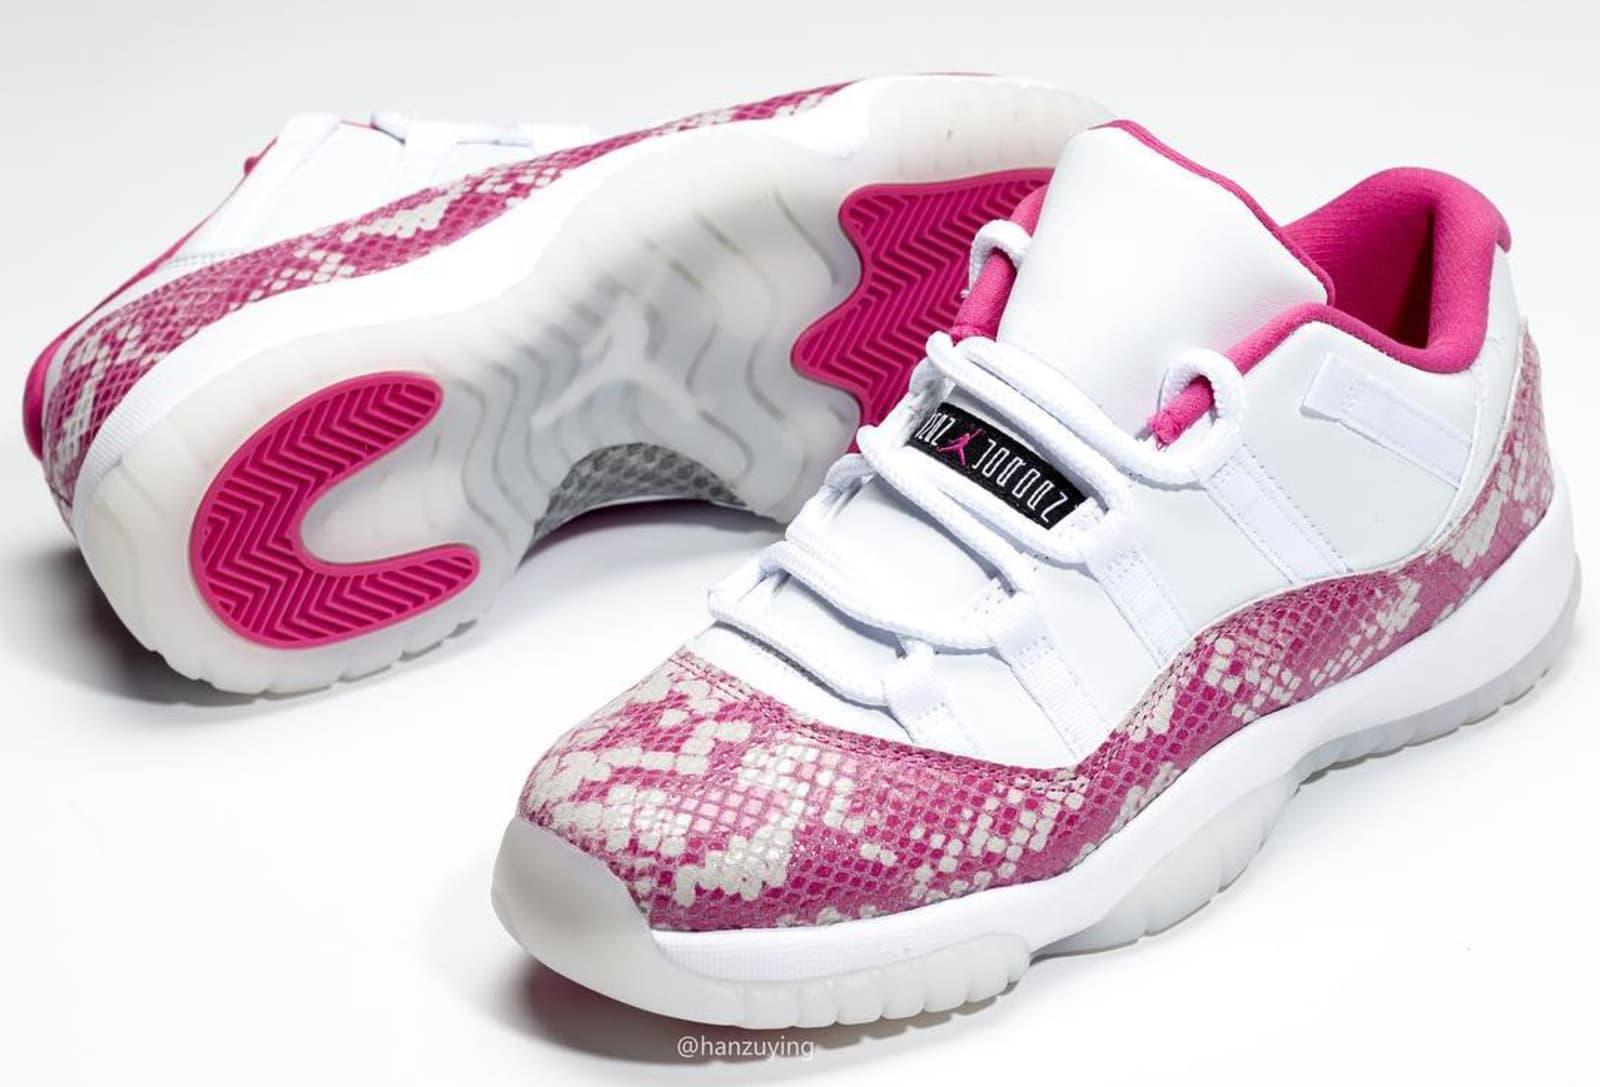 6556aa01876ea1 WMNS Air Jordan 11 Low  Pink Snakeskin  Release Date